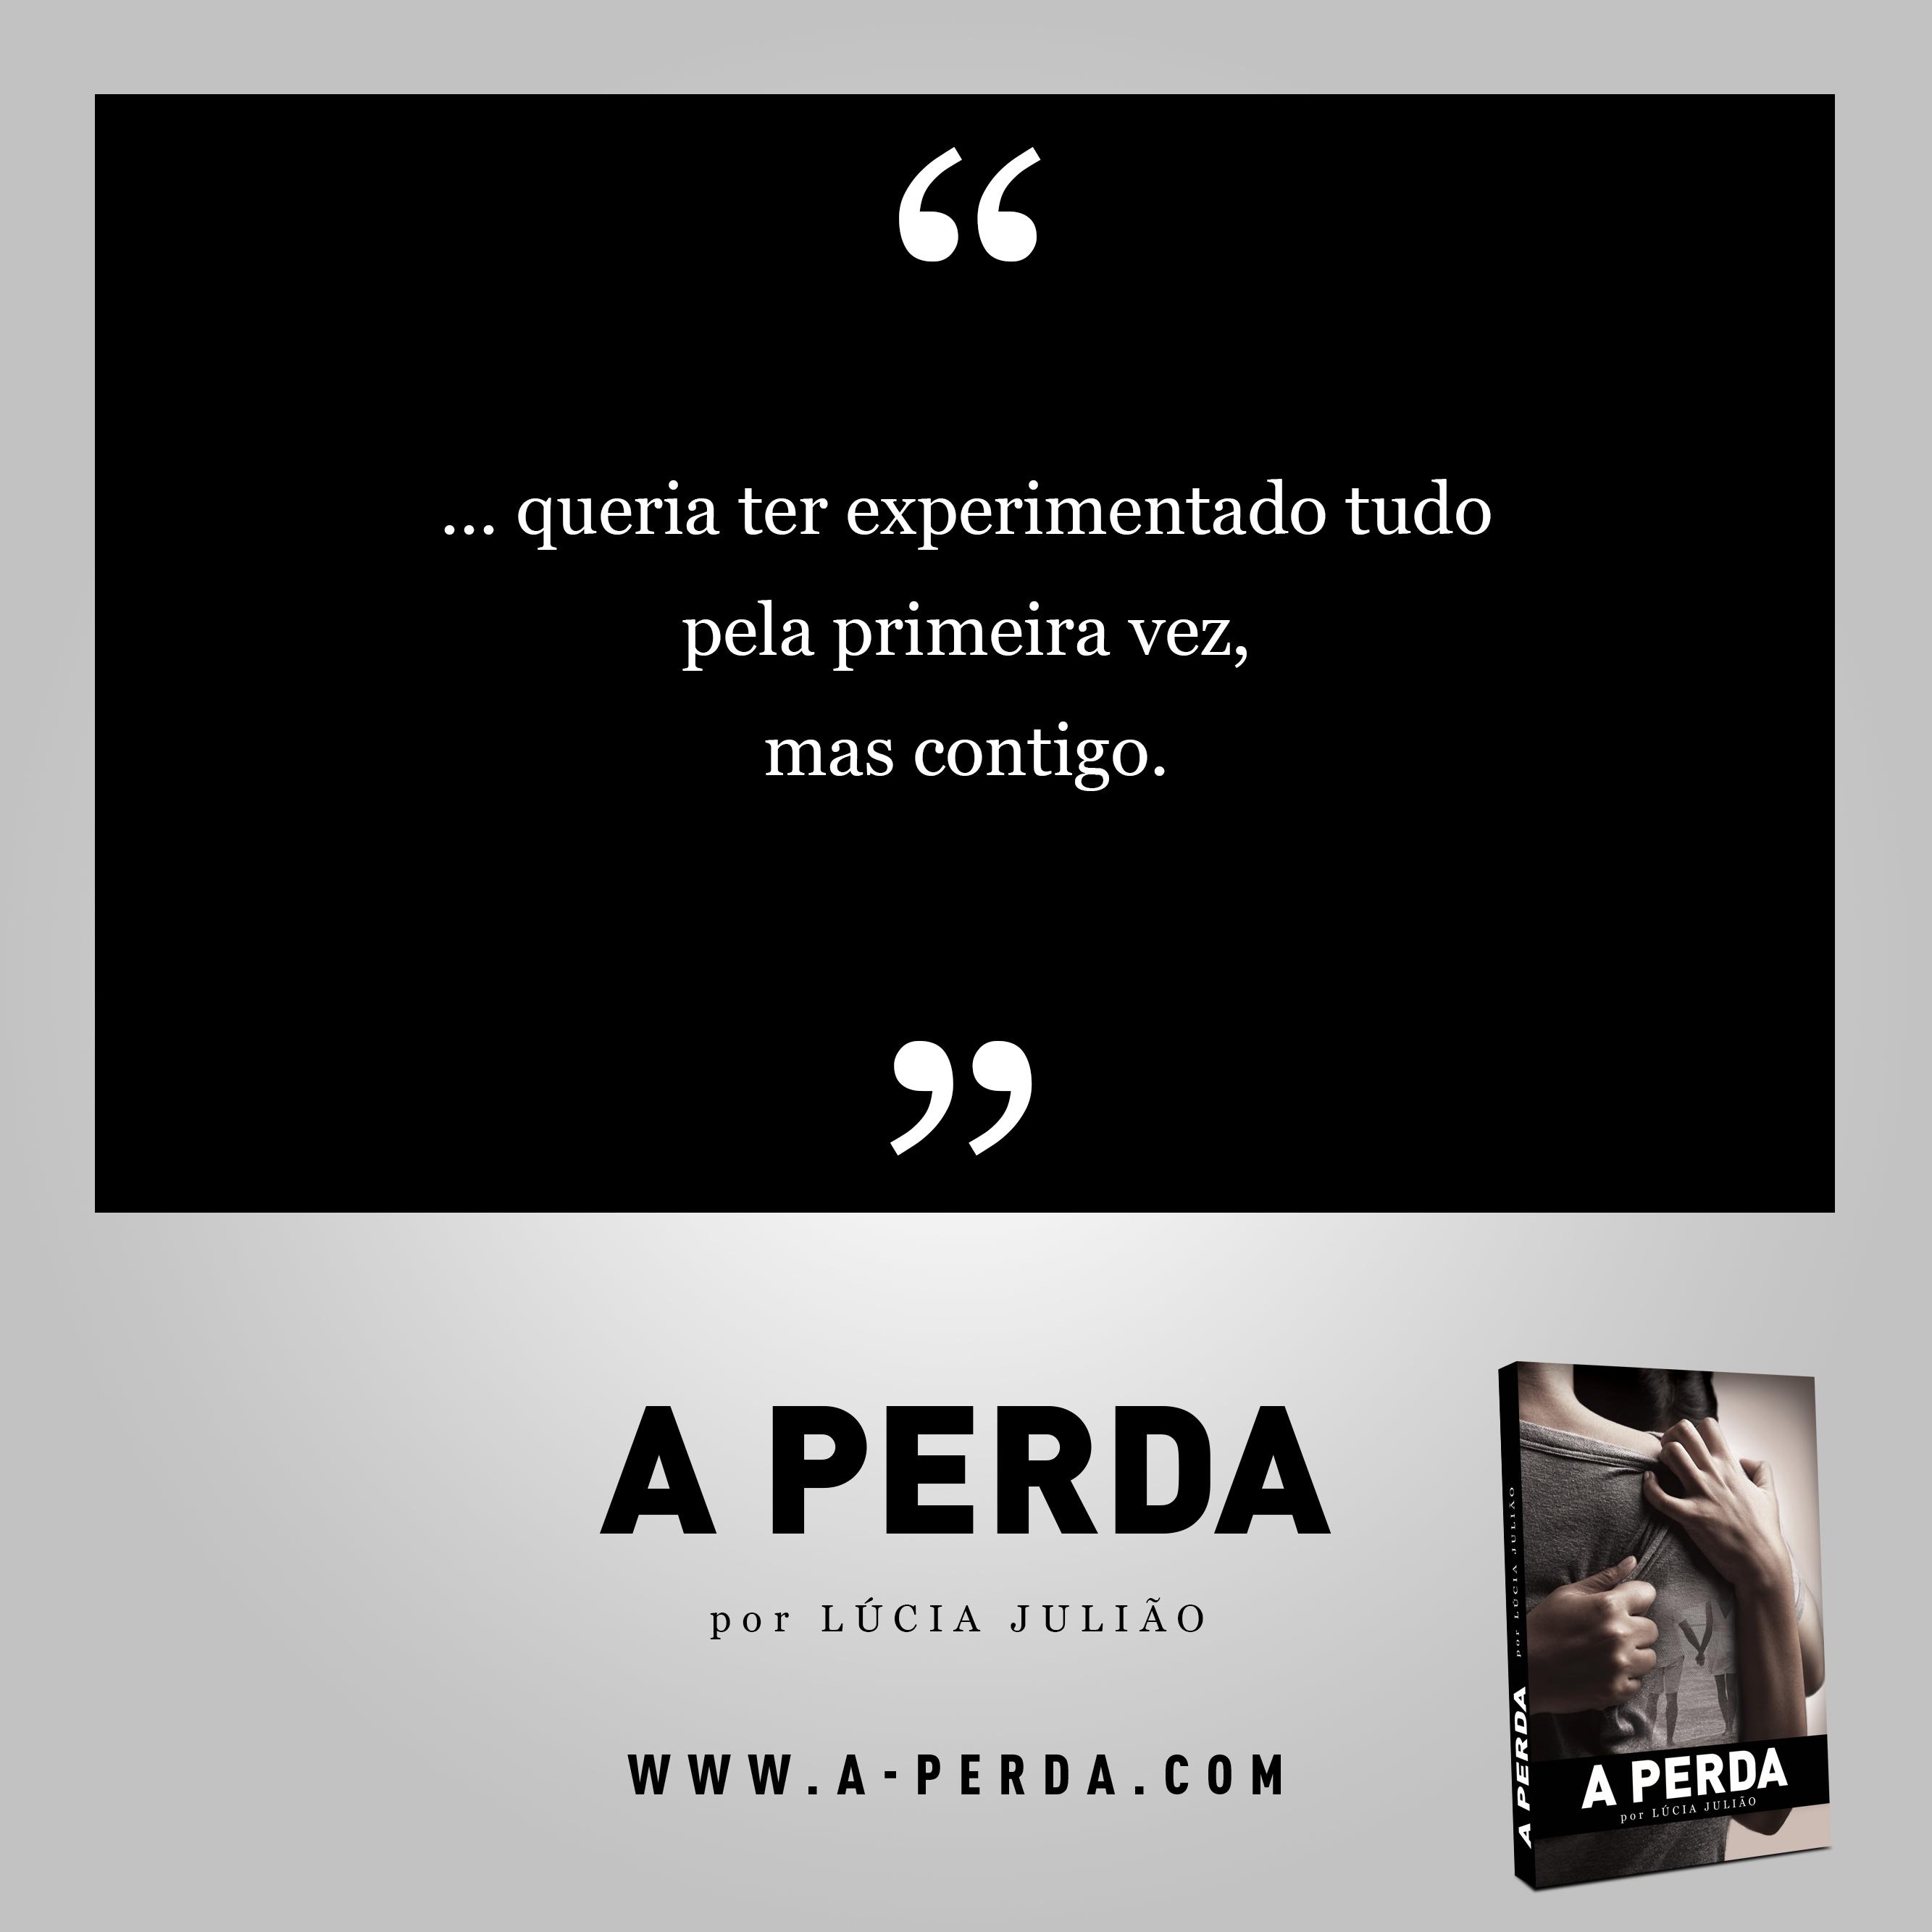 036-capitulo-8-livro-a-Perda-de-Lucia-Juliao-Instagram